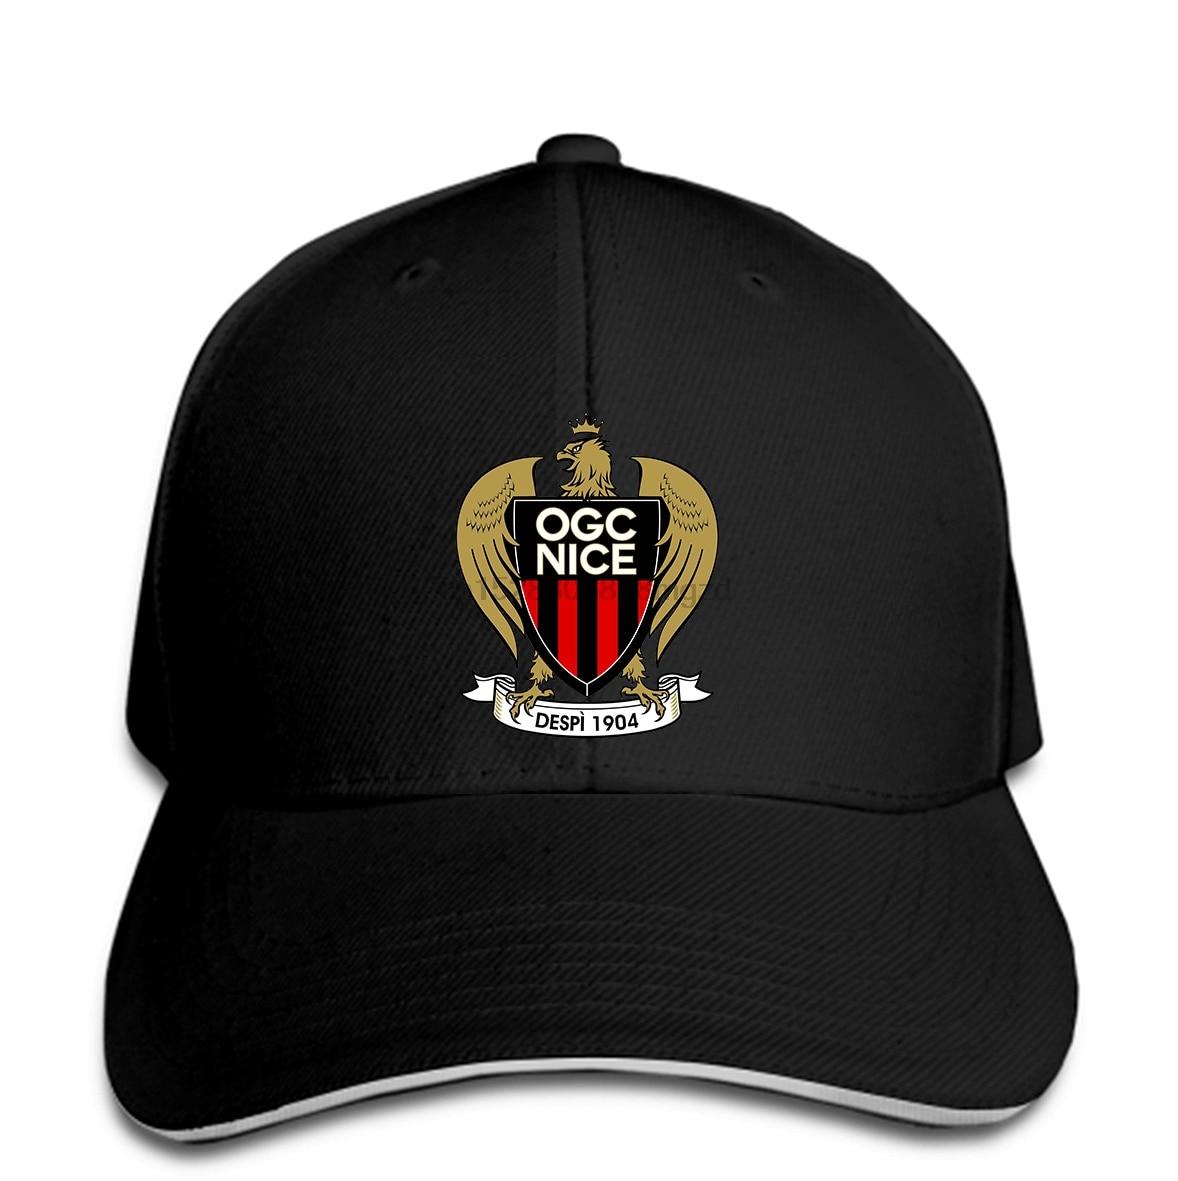 OGC Nice Les aiglon Francia Ligue fútbol hombres gorra de béisbol equipo gorra deportiva con Cierre trasero mujeres sombrero pico